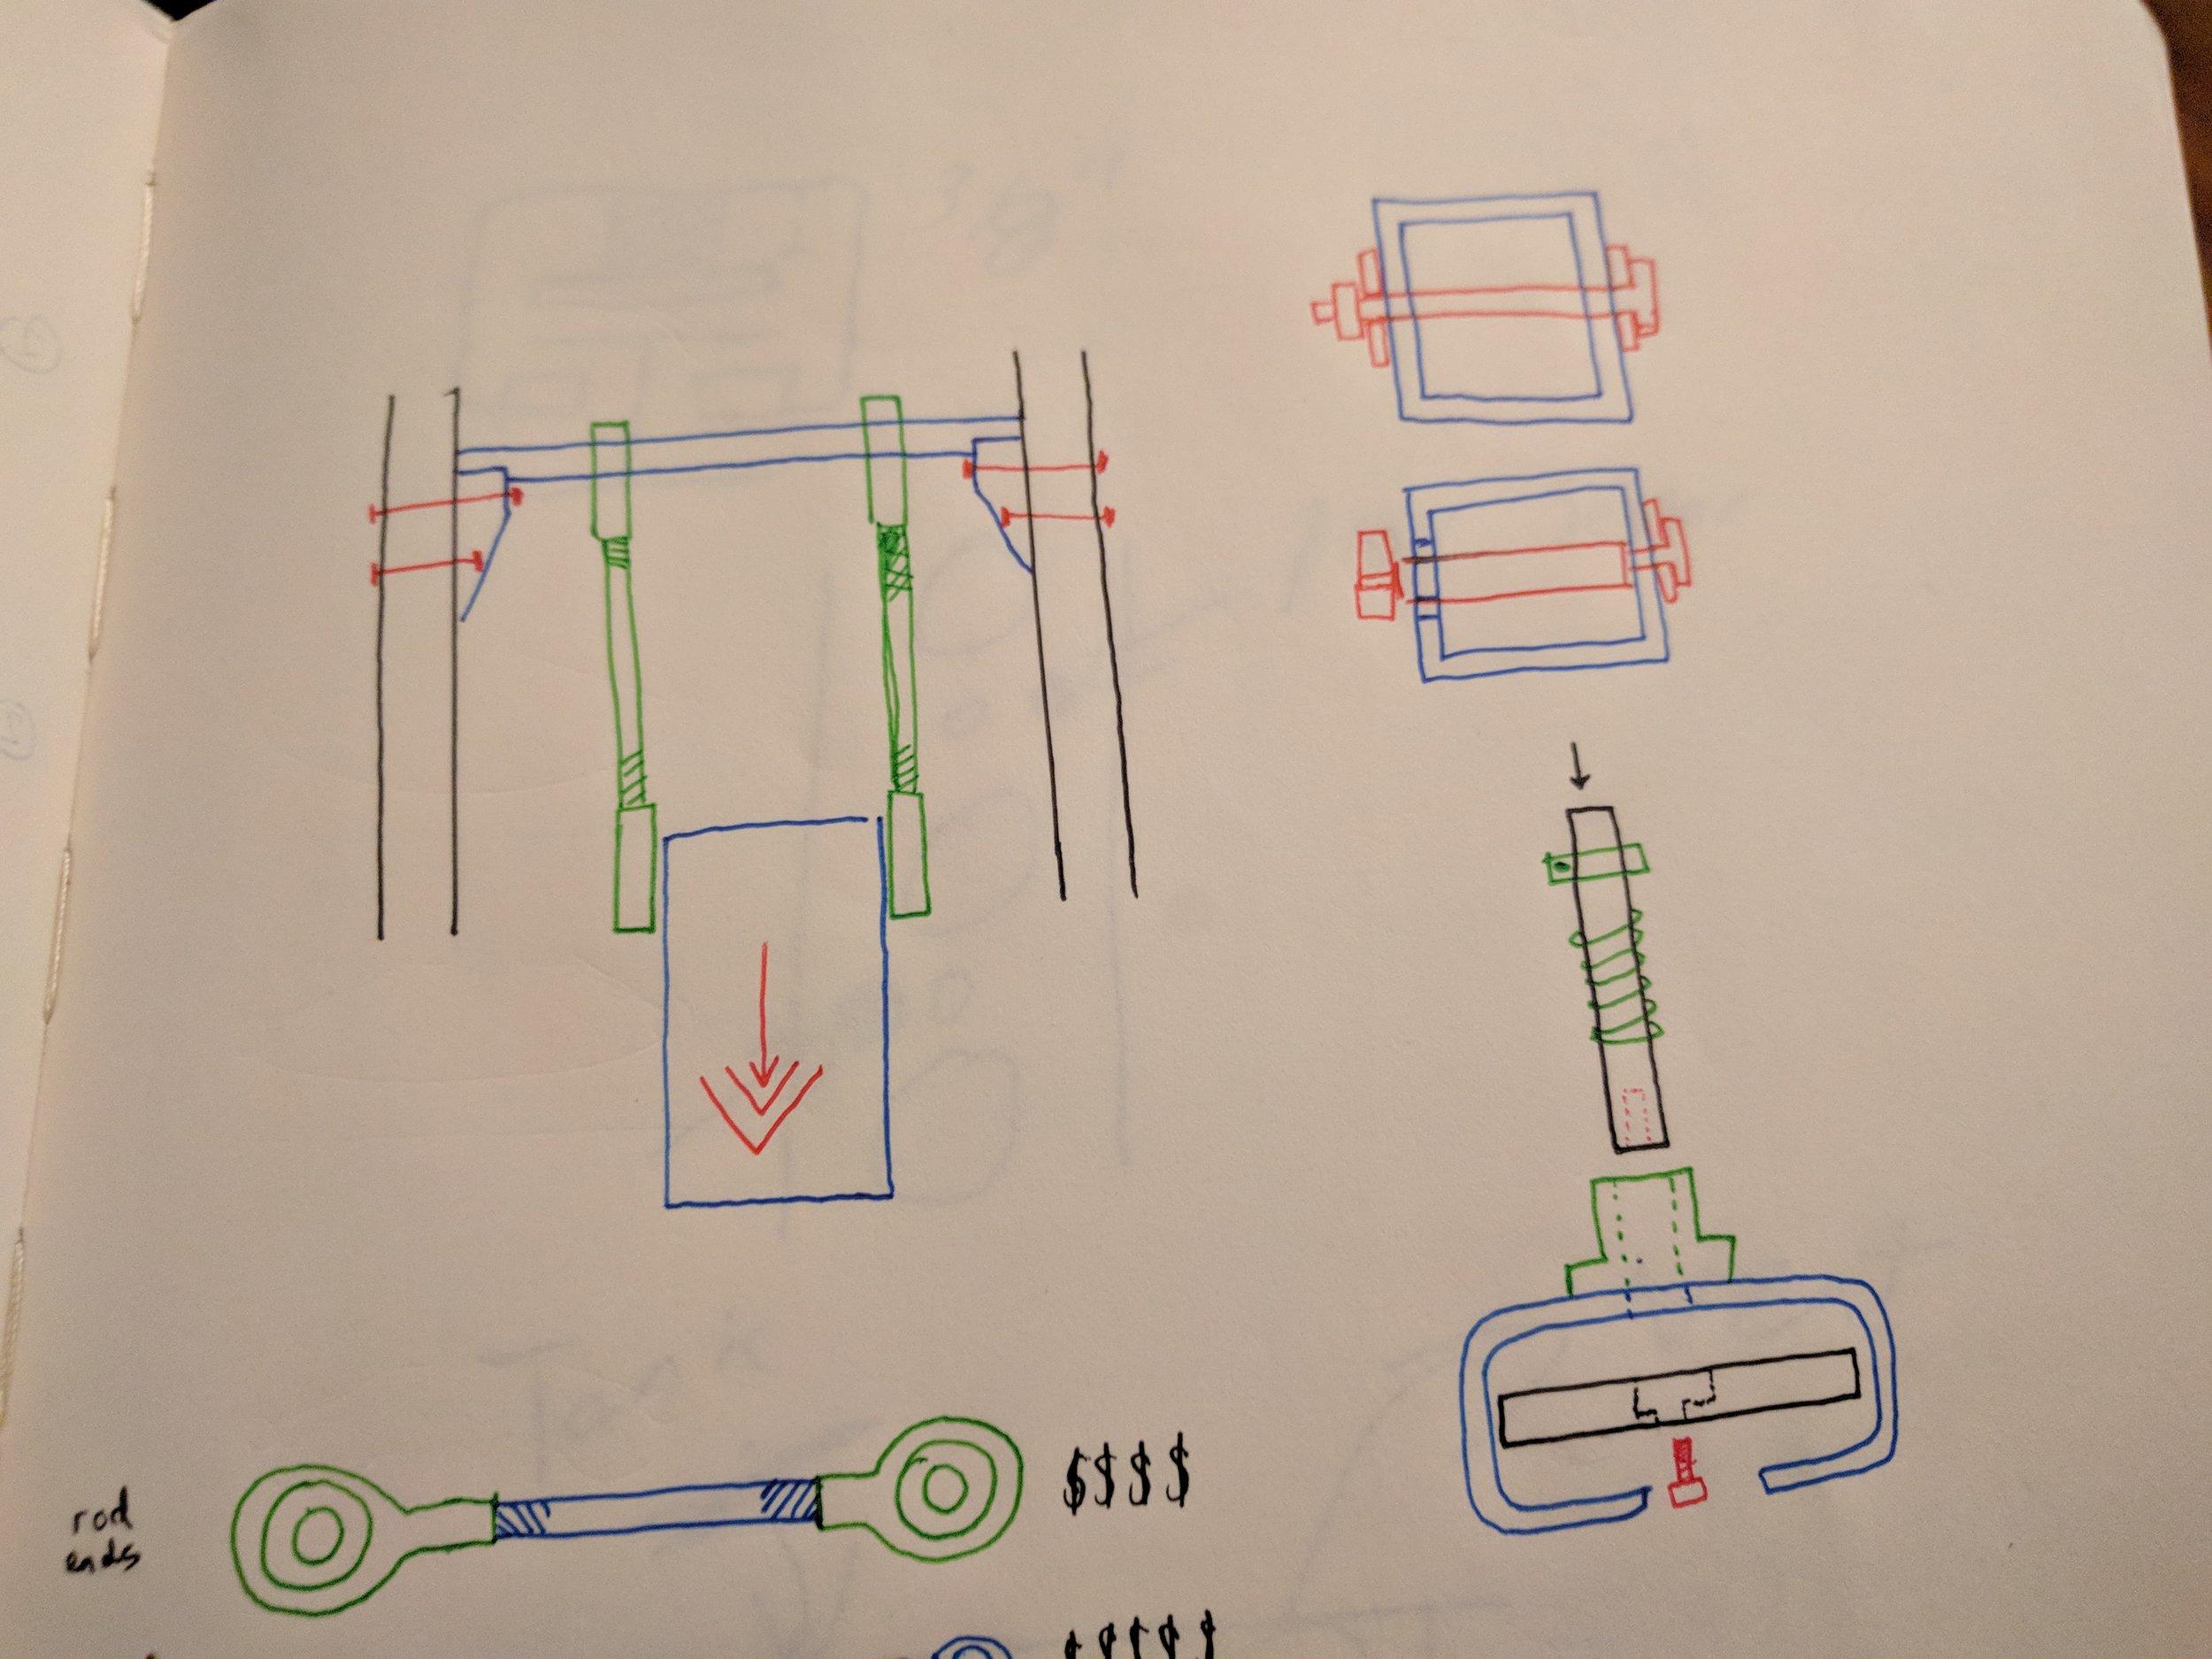 mounting and bearing stackup concepts